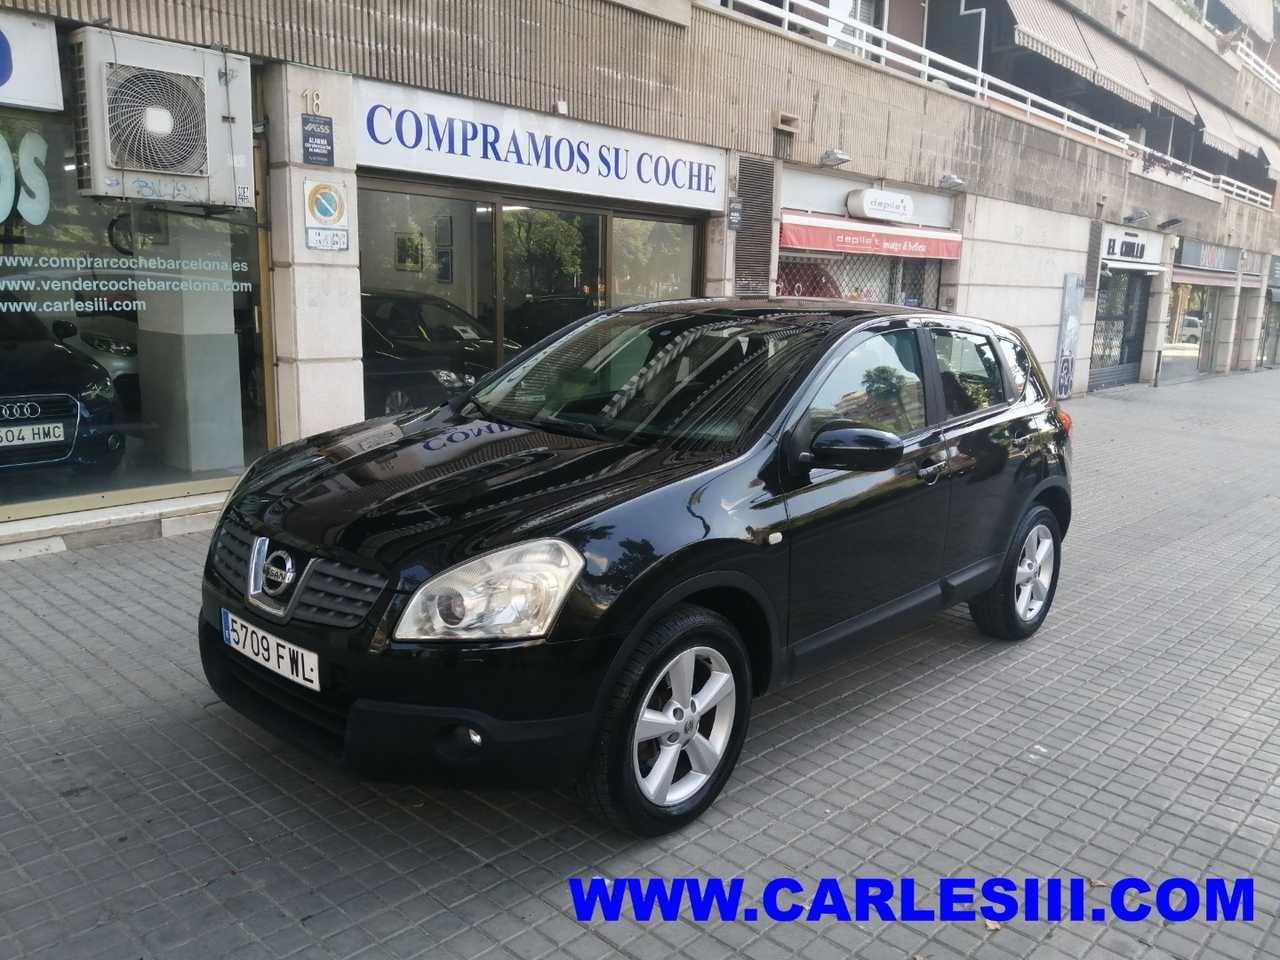 Nissan Qashqai 2.0 dCi TEKNA 4x4 AT NavCaVPiel Negra   - Foto 1